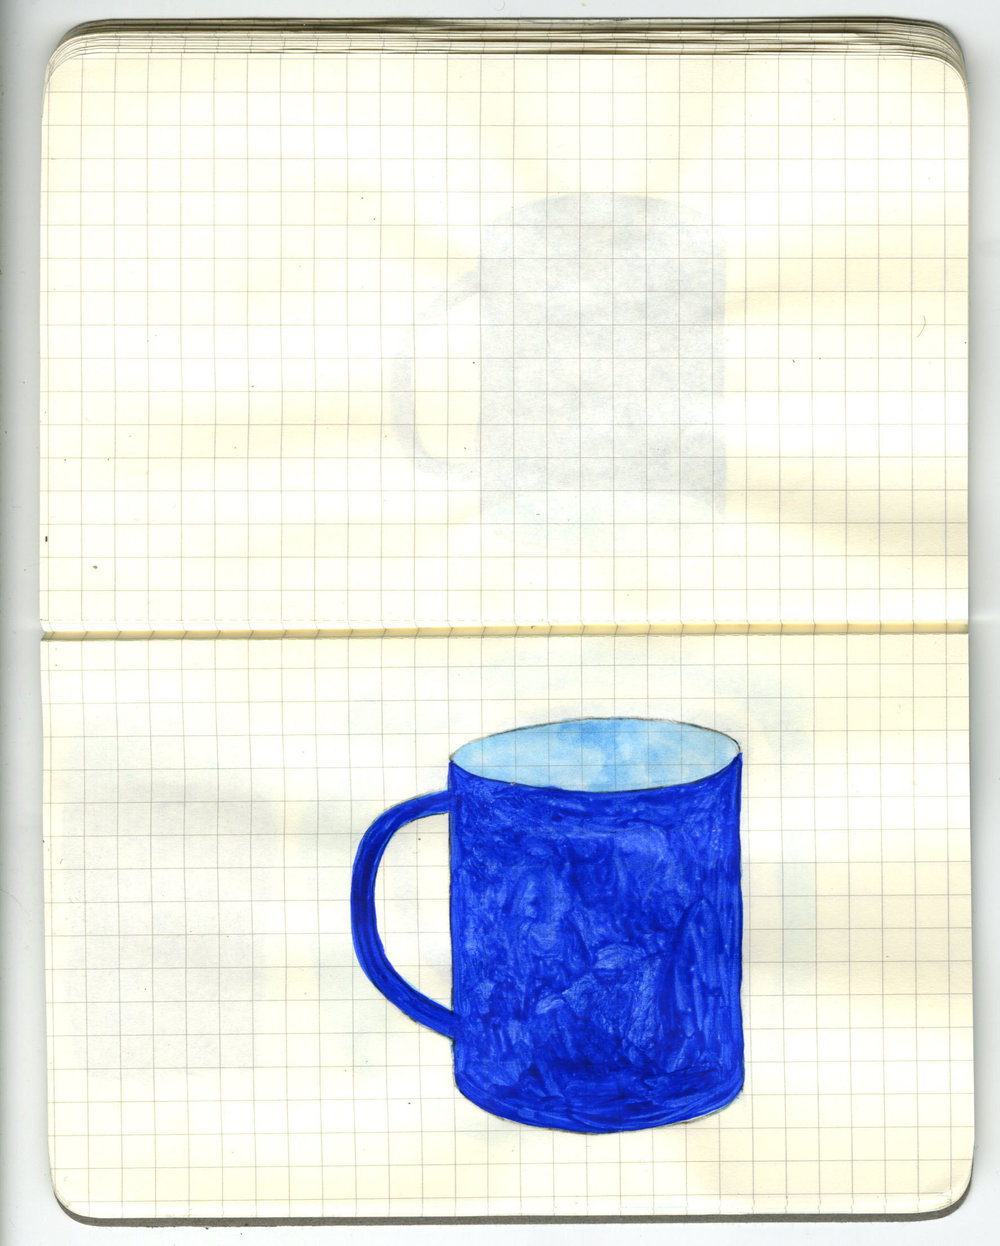 cup022.jpg